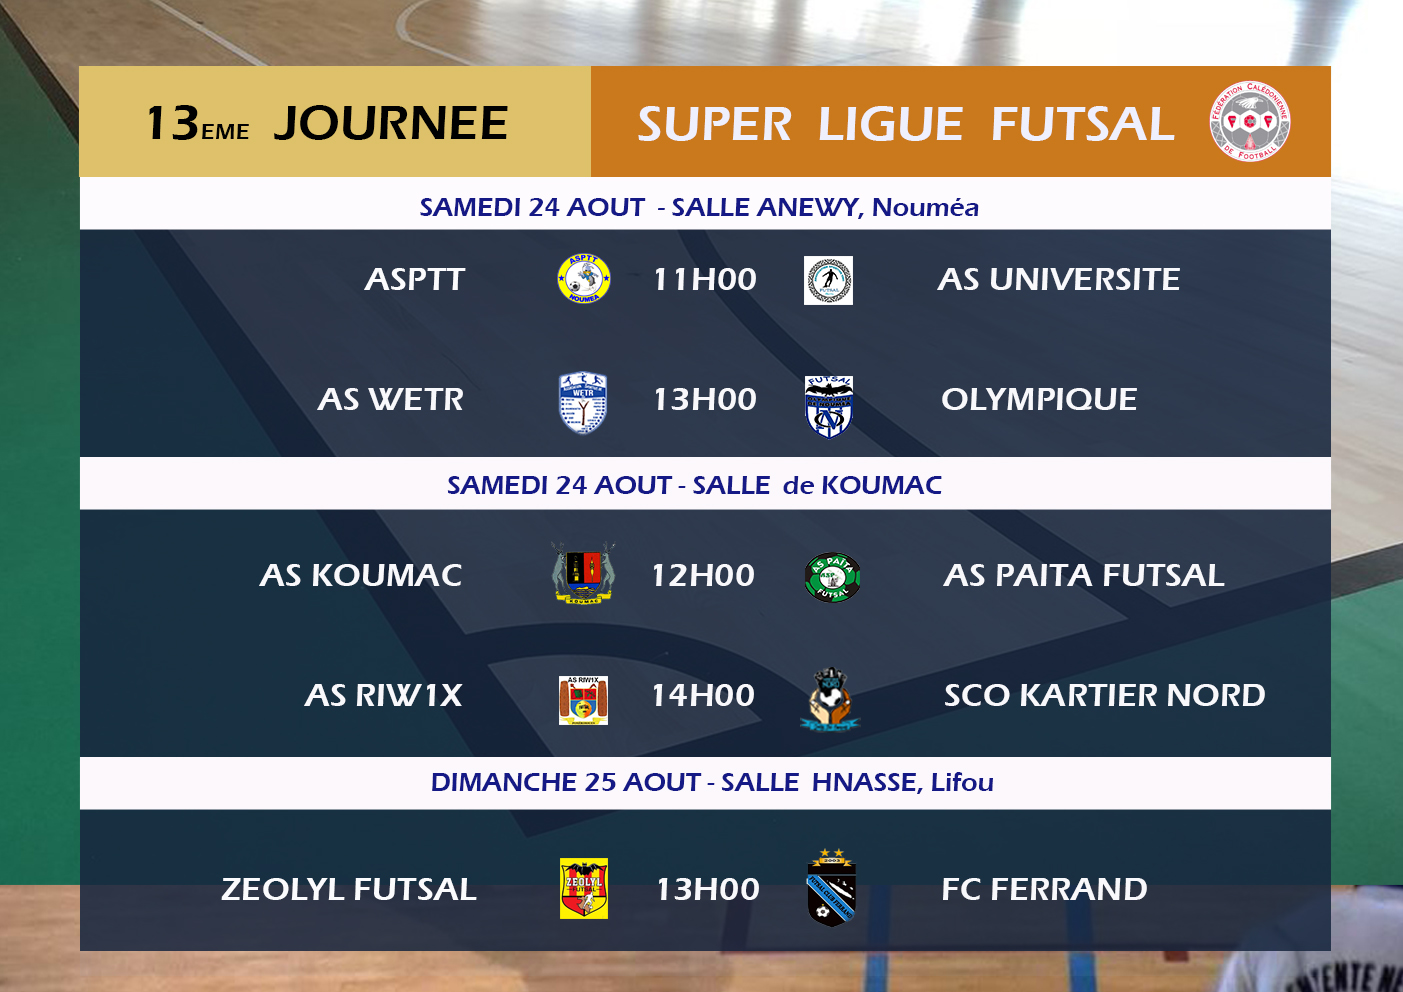 Programme du week-end : Mobil Super Ligue (J12) - Super Ligue Futsal (J13) - Estonie vs NC (U18)